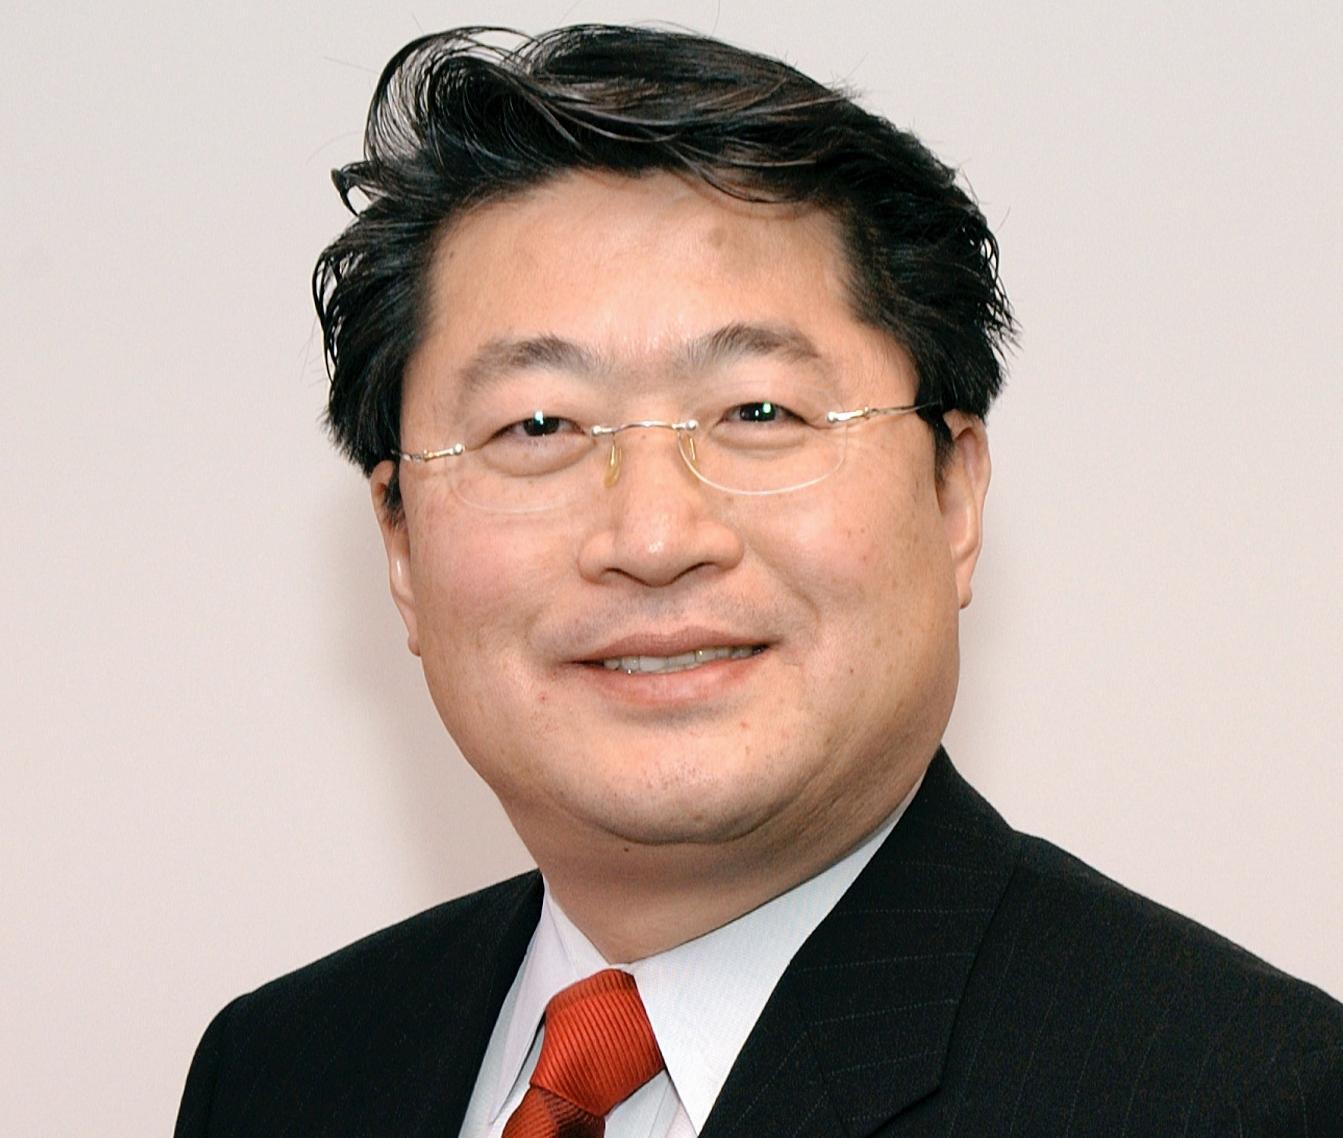 SUNGSU JOHN KANG  Your Registered Representative & Insurance Agent